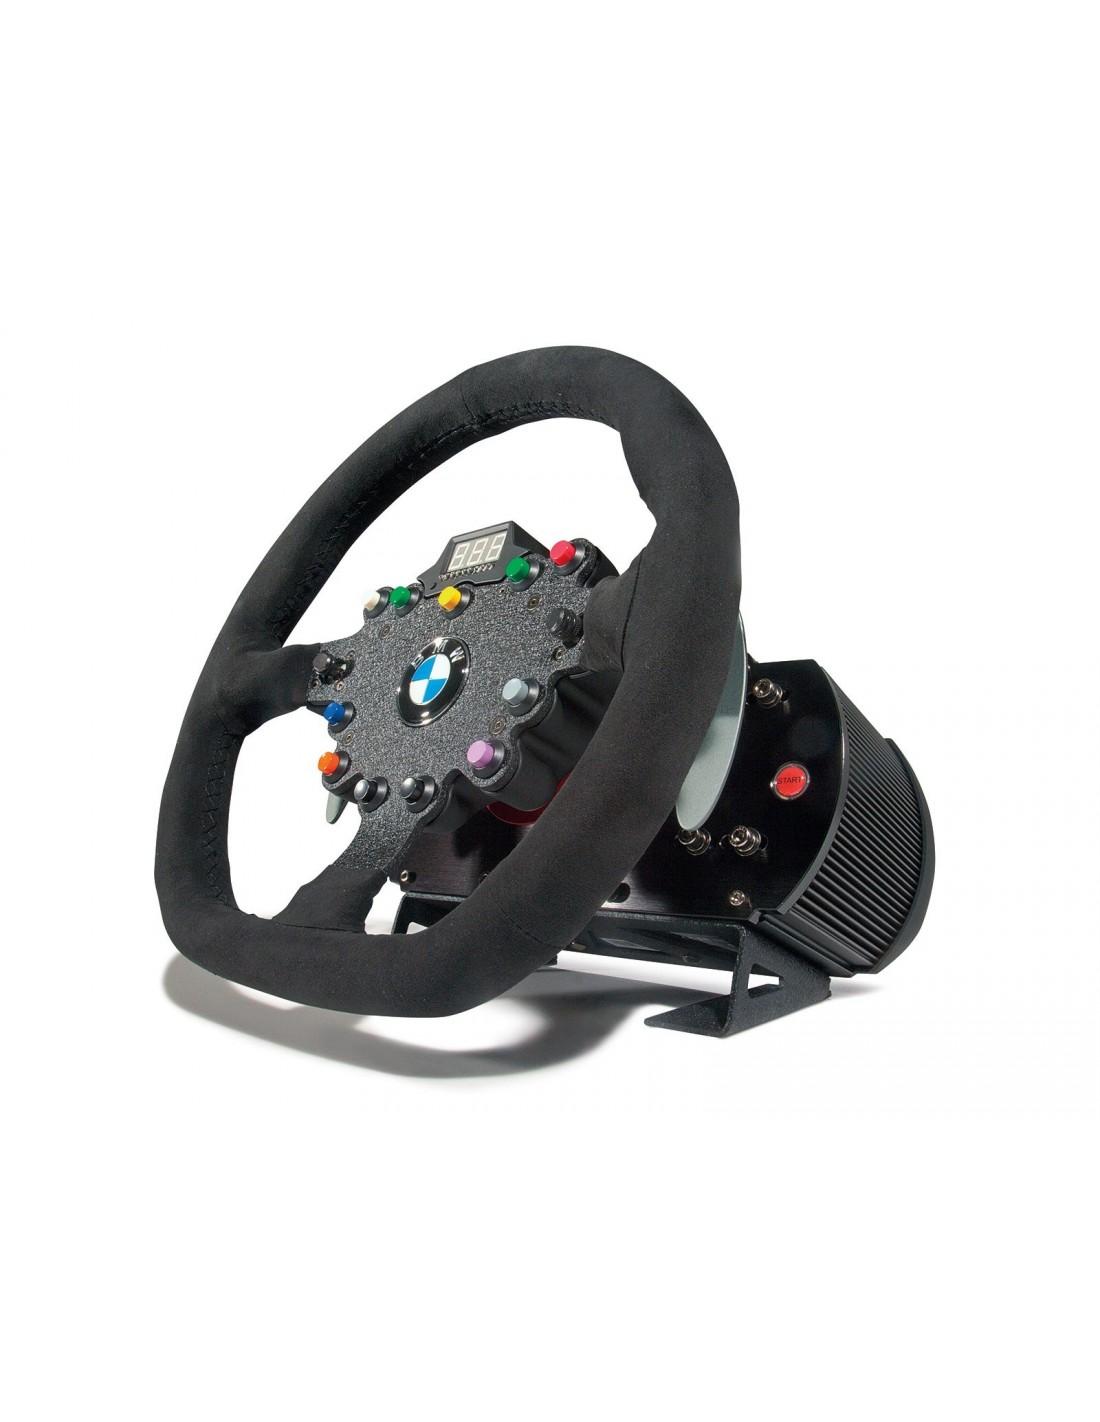 Fanatec Gt2 Wheel Wheel Rim Bmw m3 Gt2